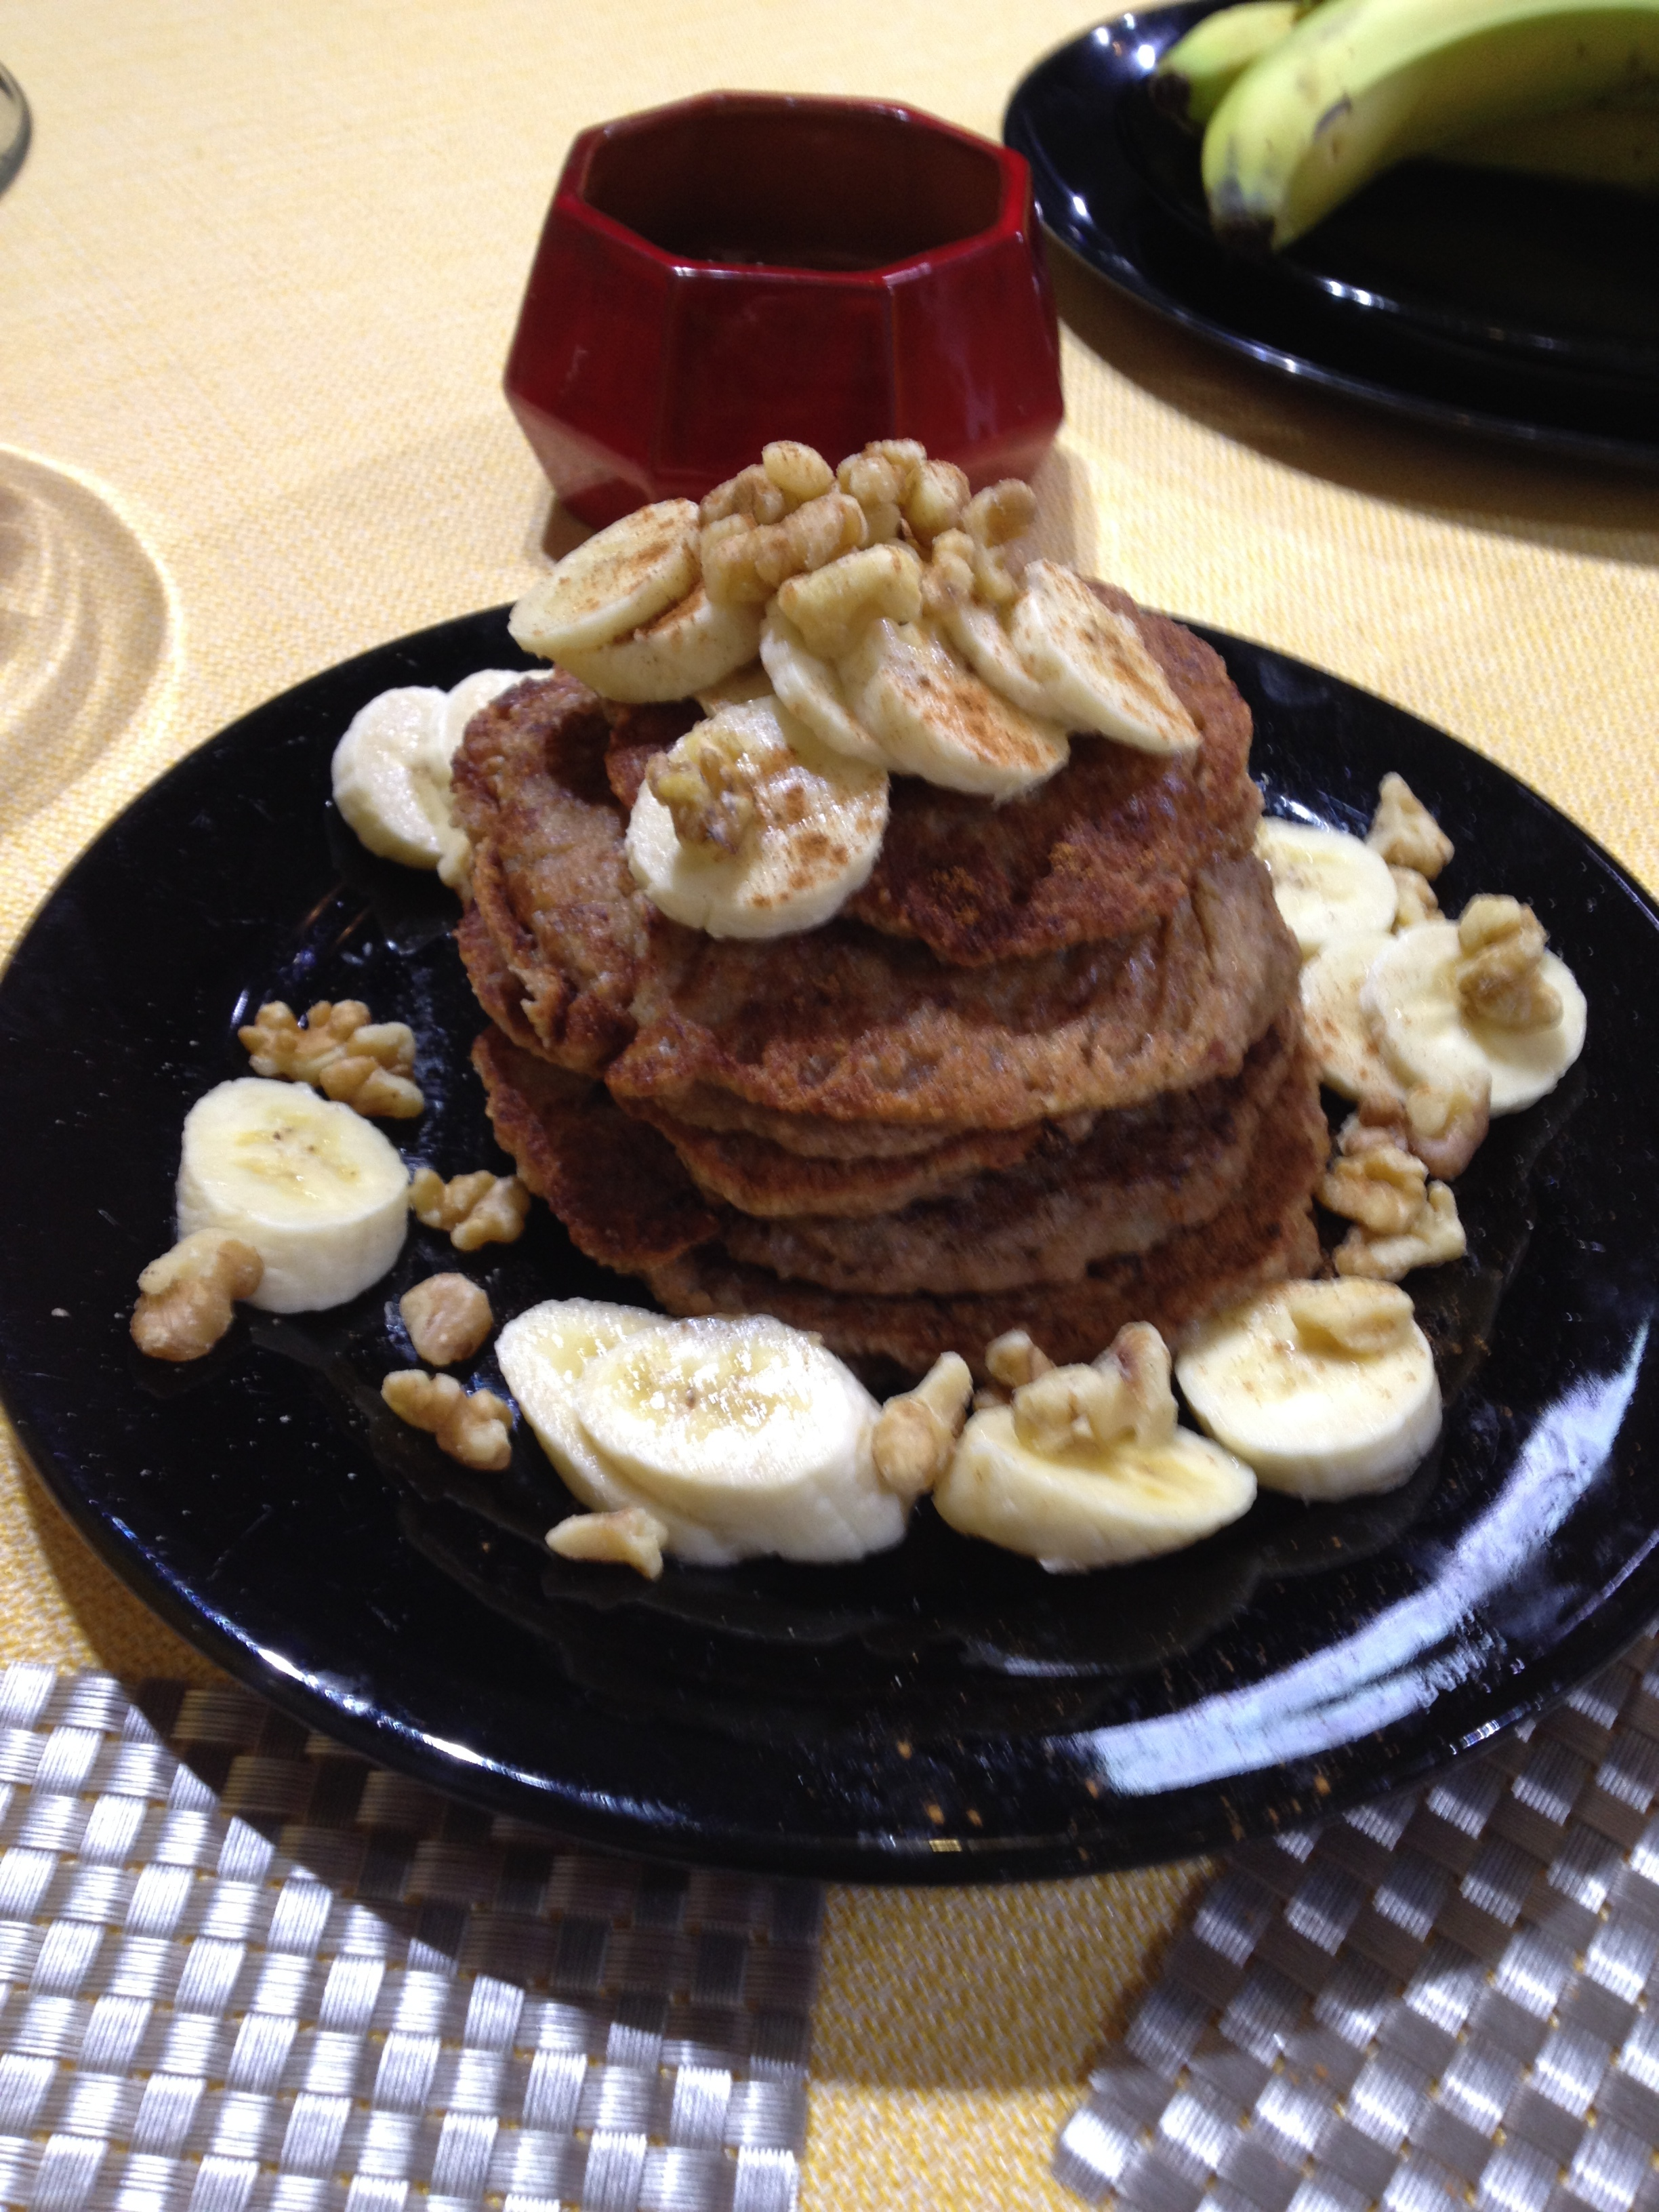 Banana Bliss Pancakesfrom Eat More Plants